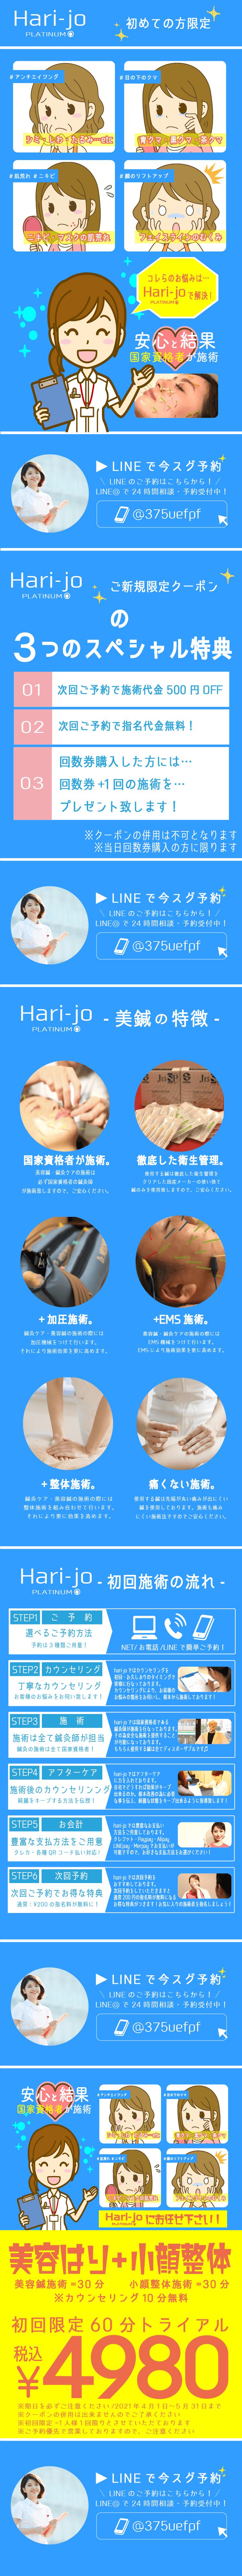 Hari-jo4-5月限定クーポン美容鍼+小顔整体60分トライアルコース4980円説明文章